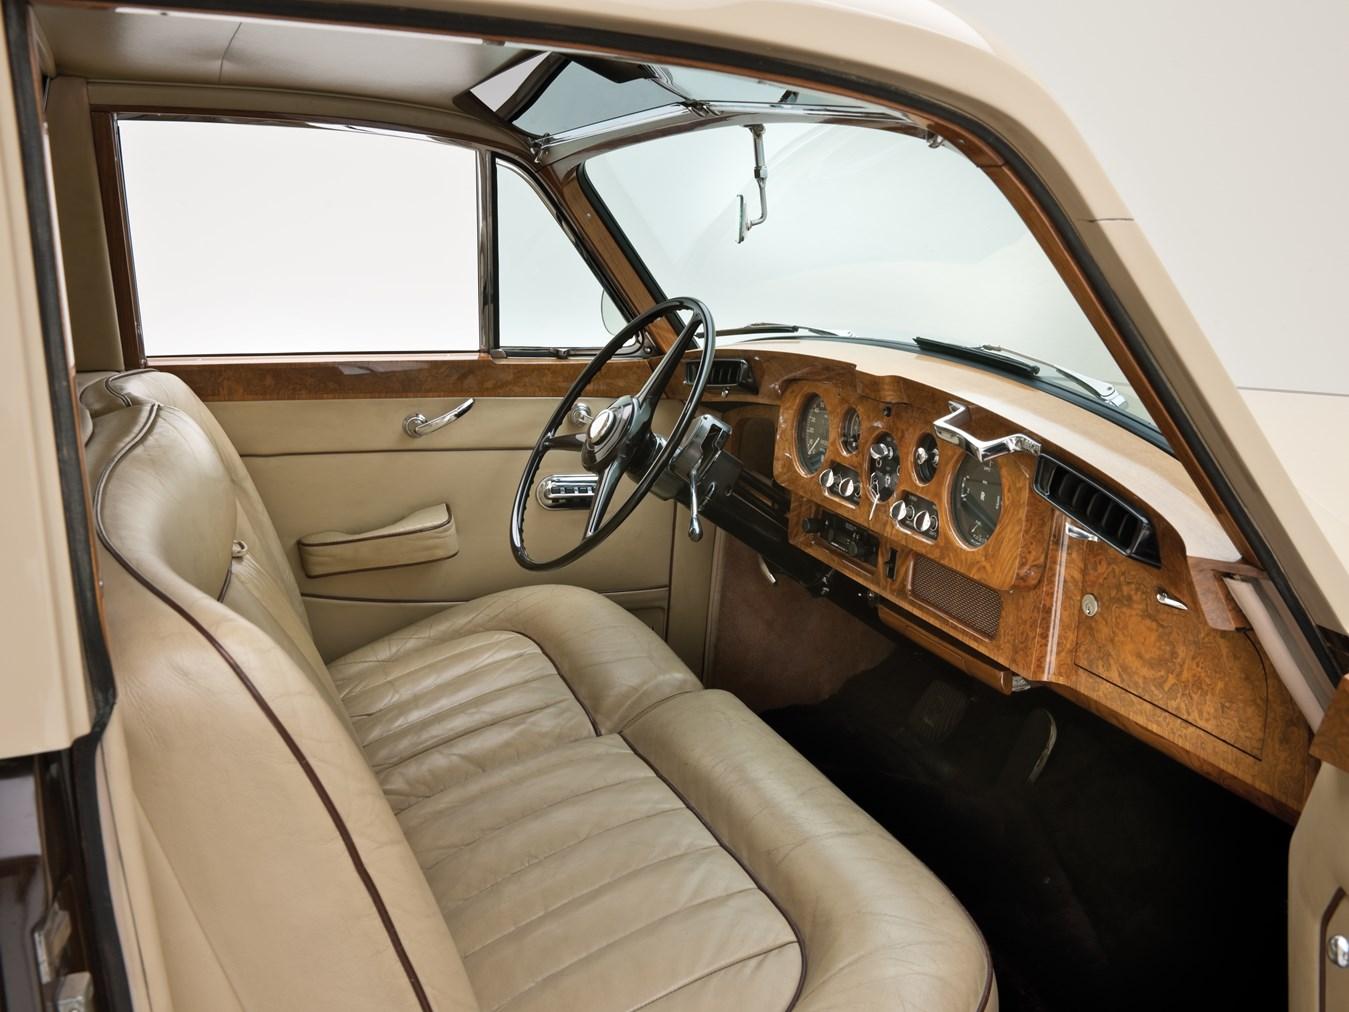 1966 Rolls-Royce Silver Cloud III Touring Limousine interior